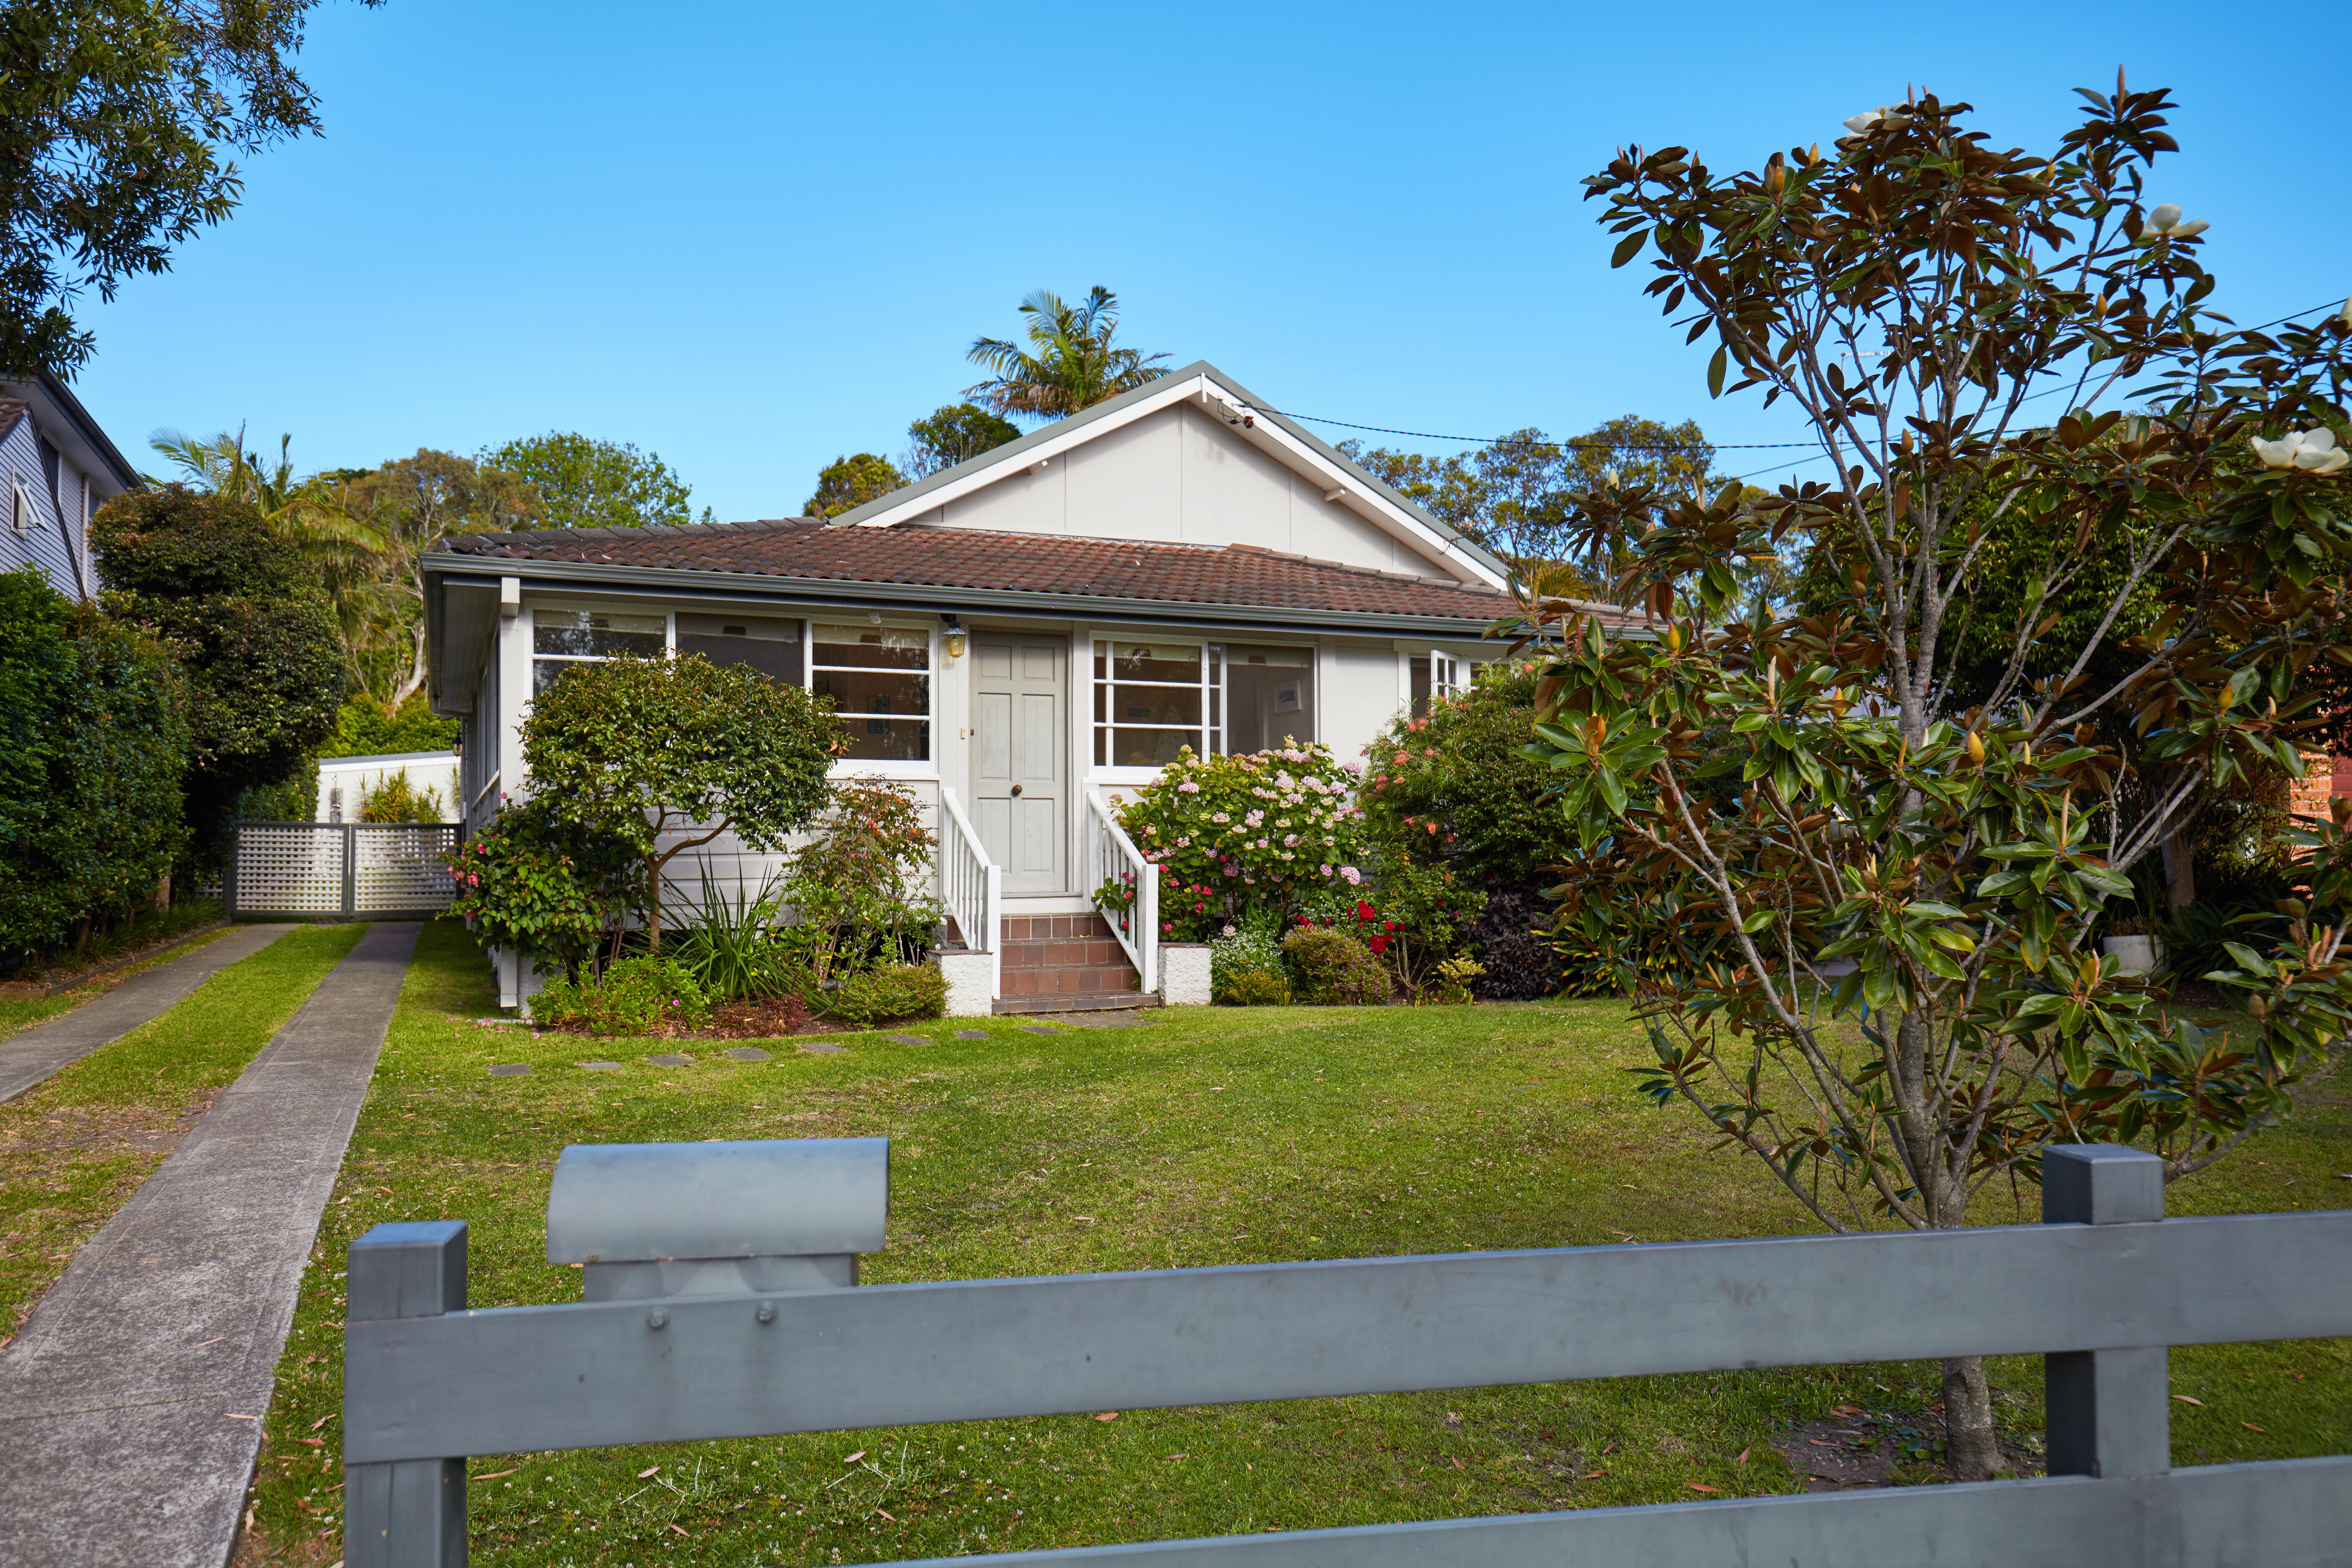 Australian house from fence in suburbs against sky